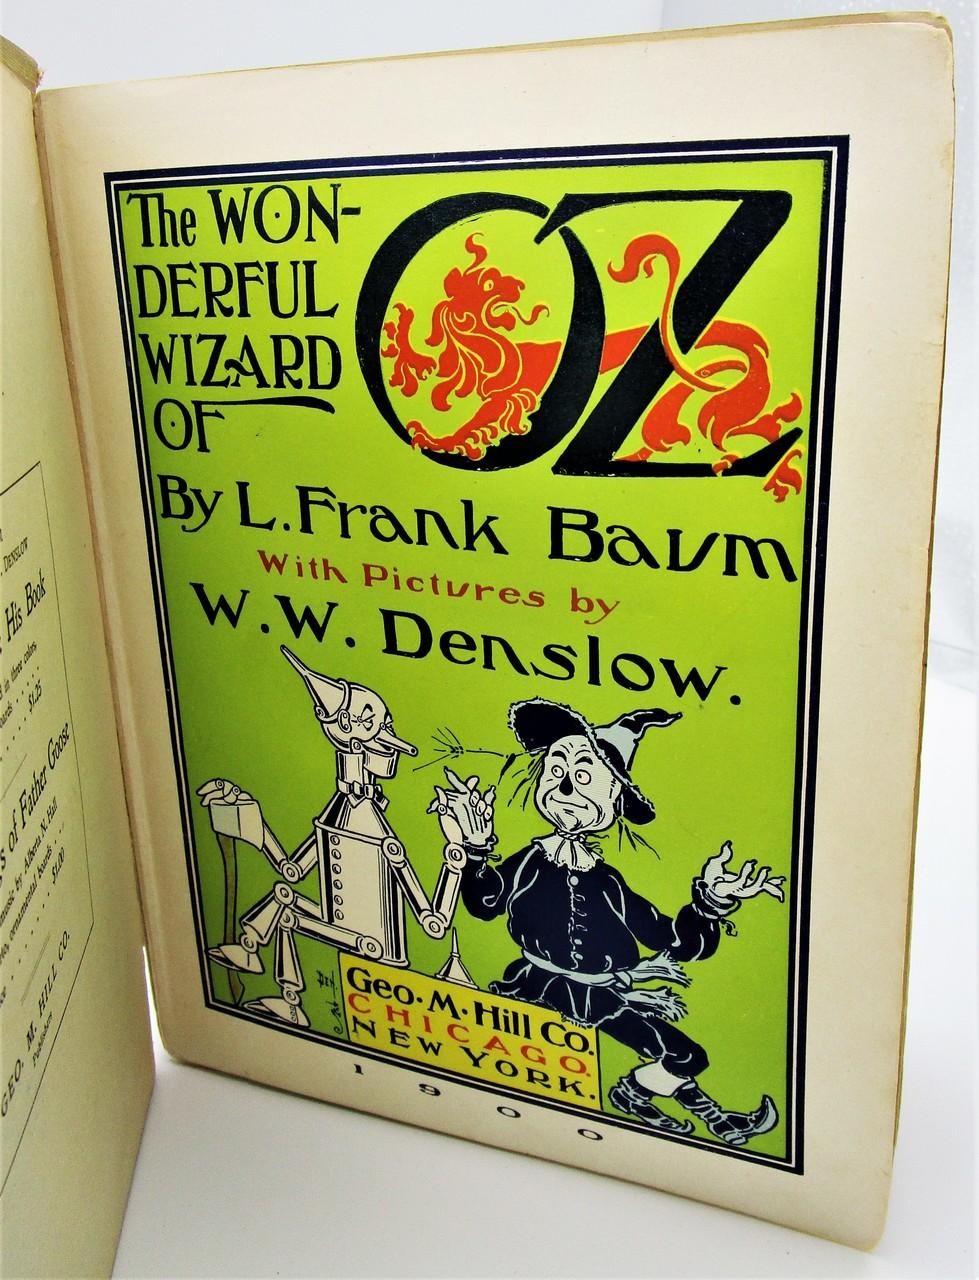 THE WONDERFUL WIZARD OF OZ, by L. Frank Baum & Denslow - 1900 [1st Ed]